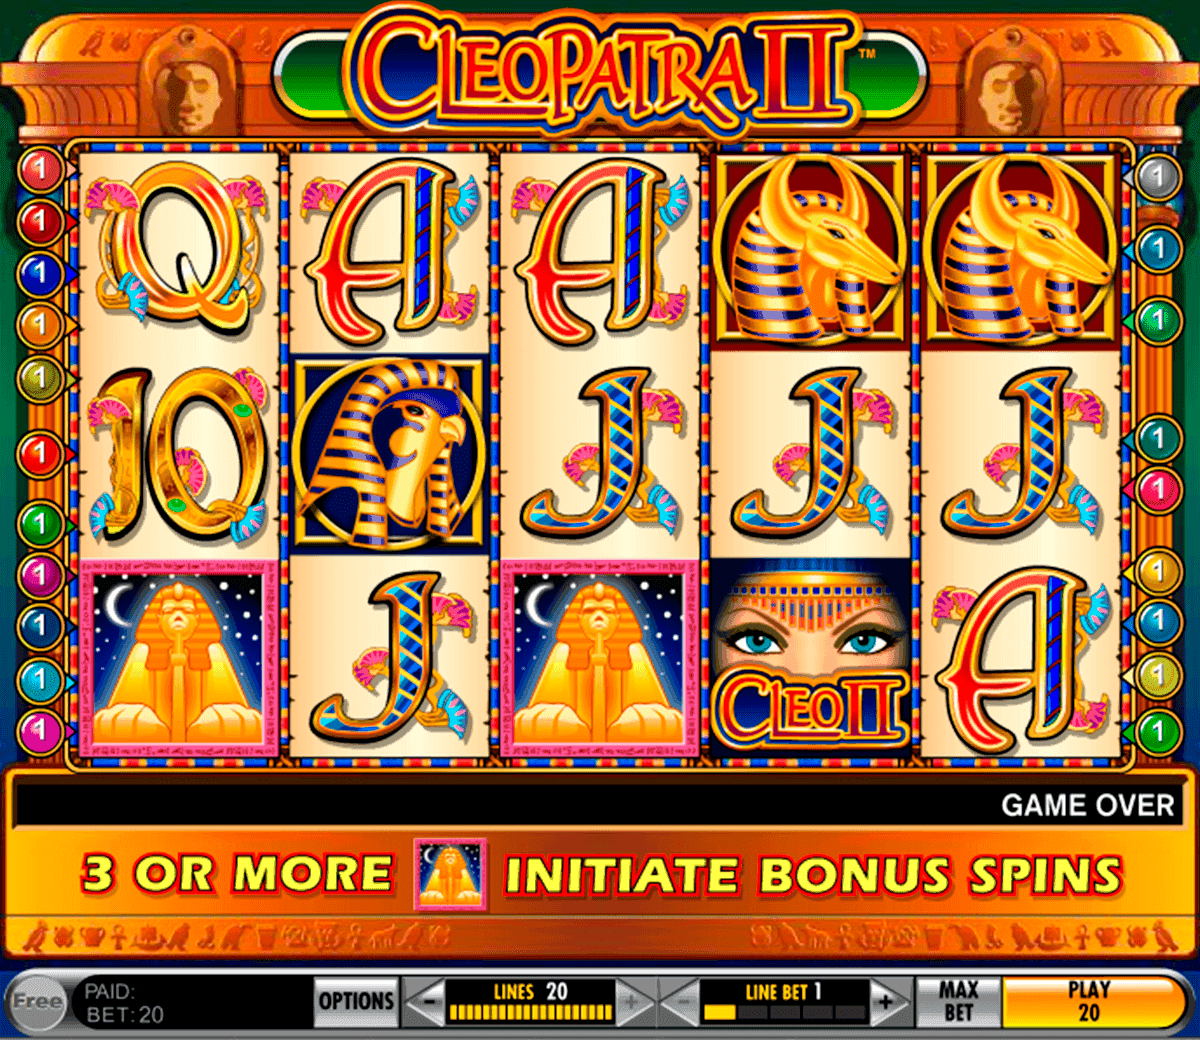 Slots machines gratis